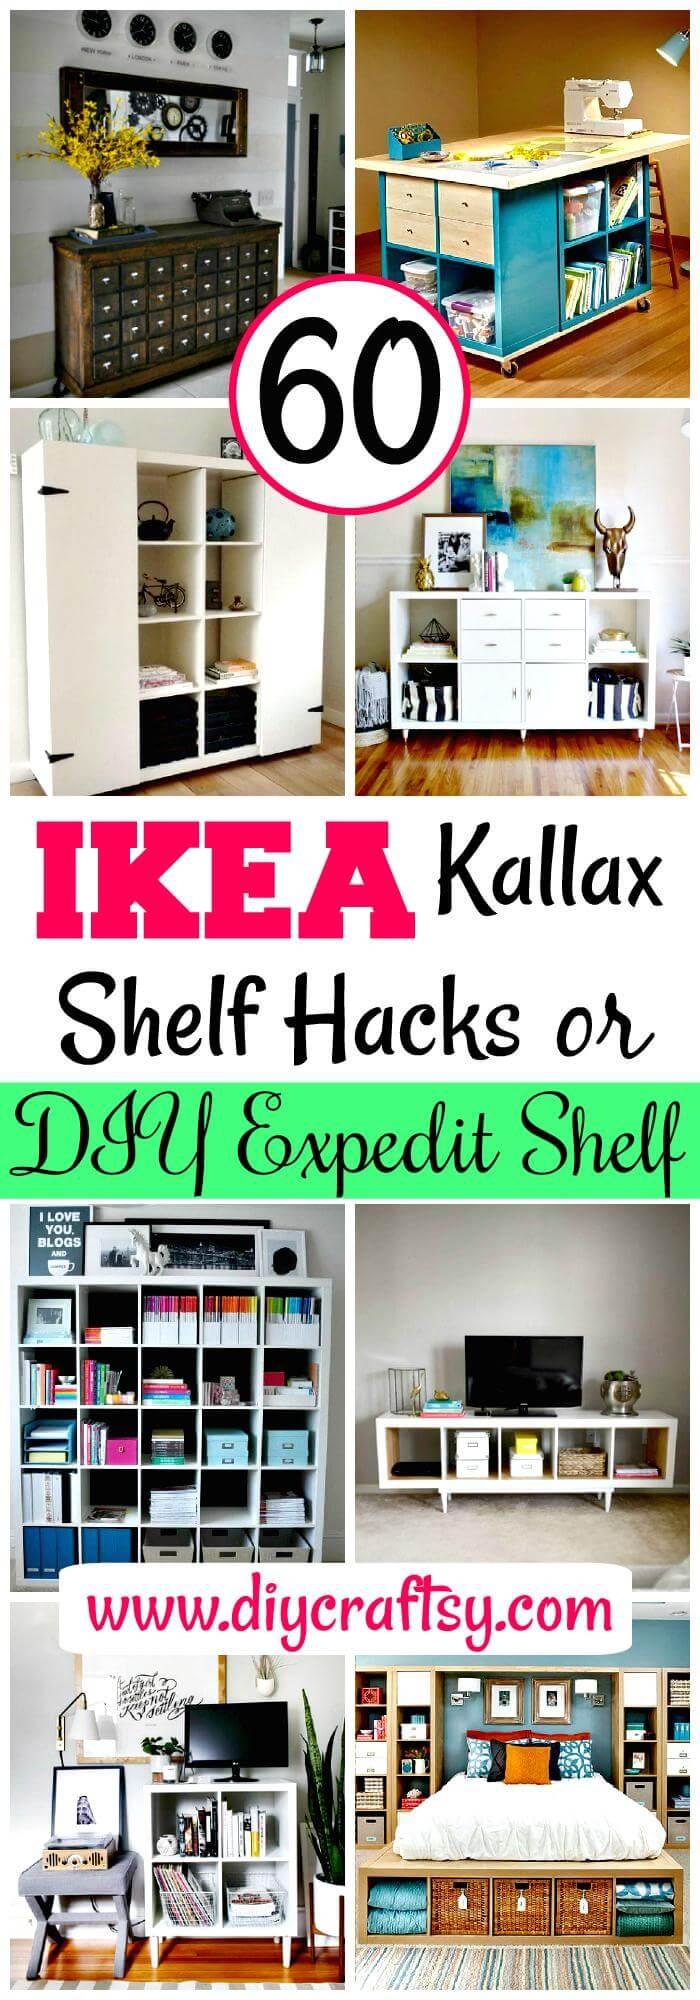 IKEA Kallax Shelf Hacks